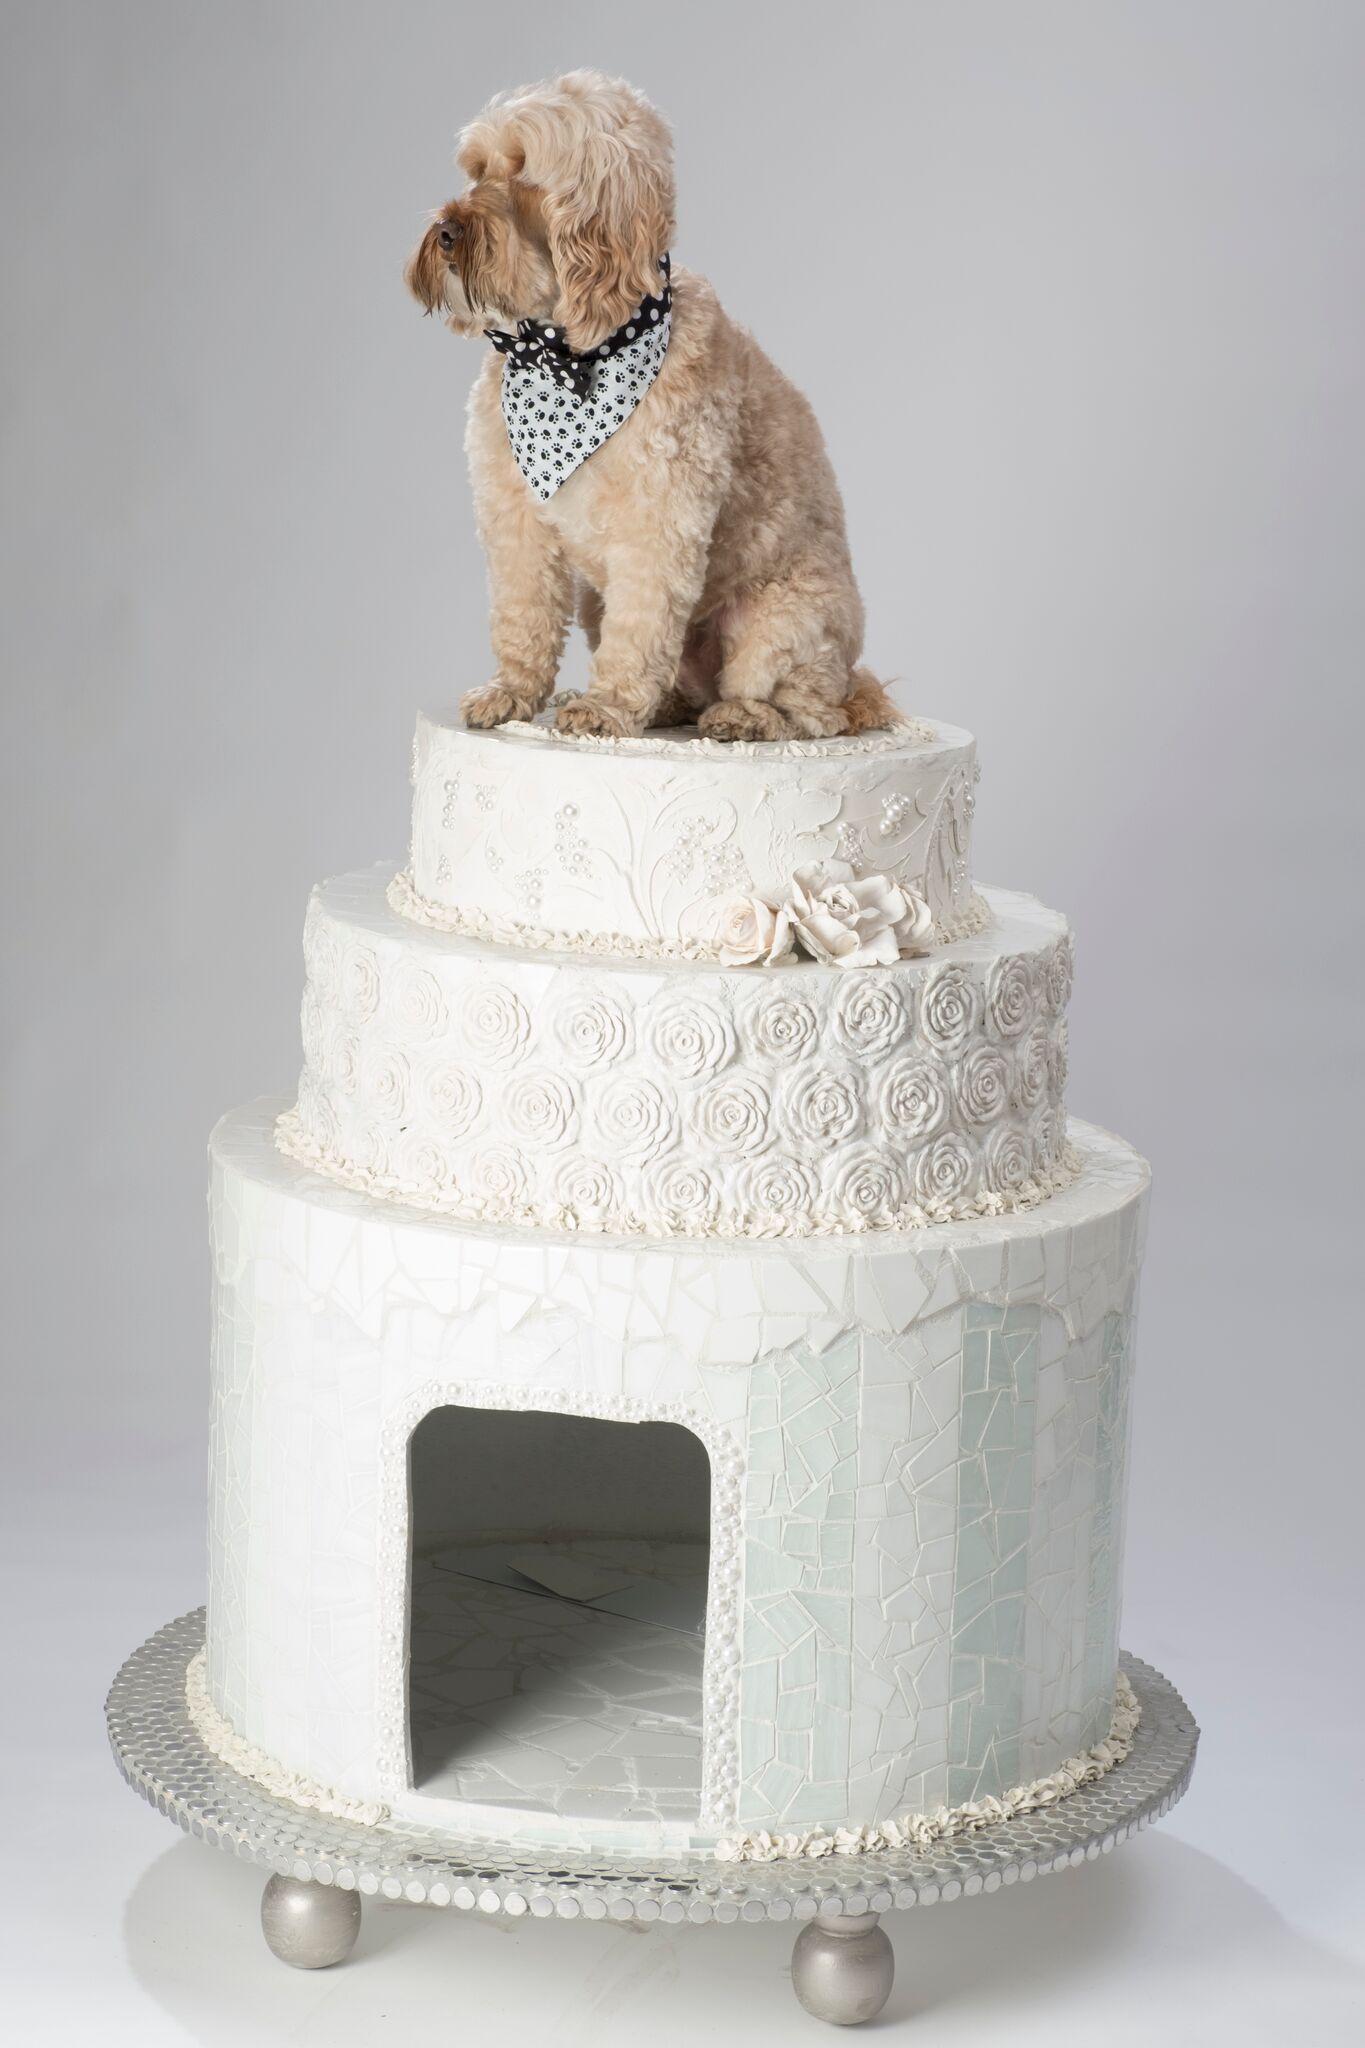 Jeff Monsein - The Royal Wedding Cake House - Image 7 of 9